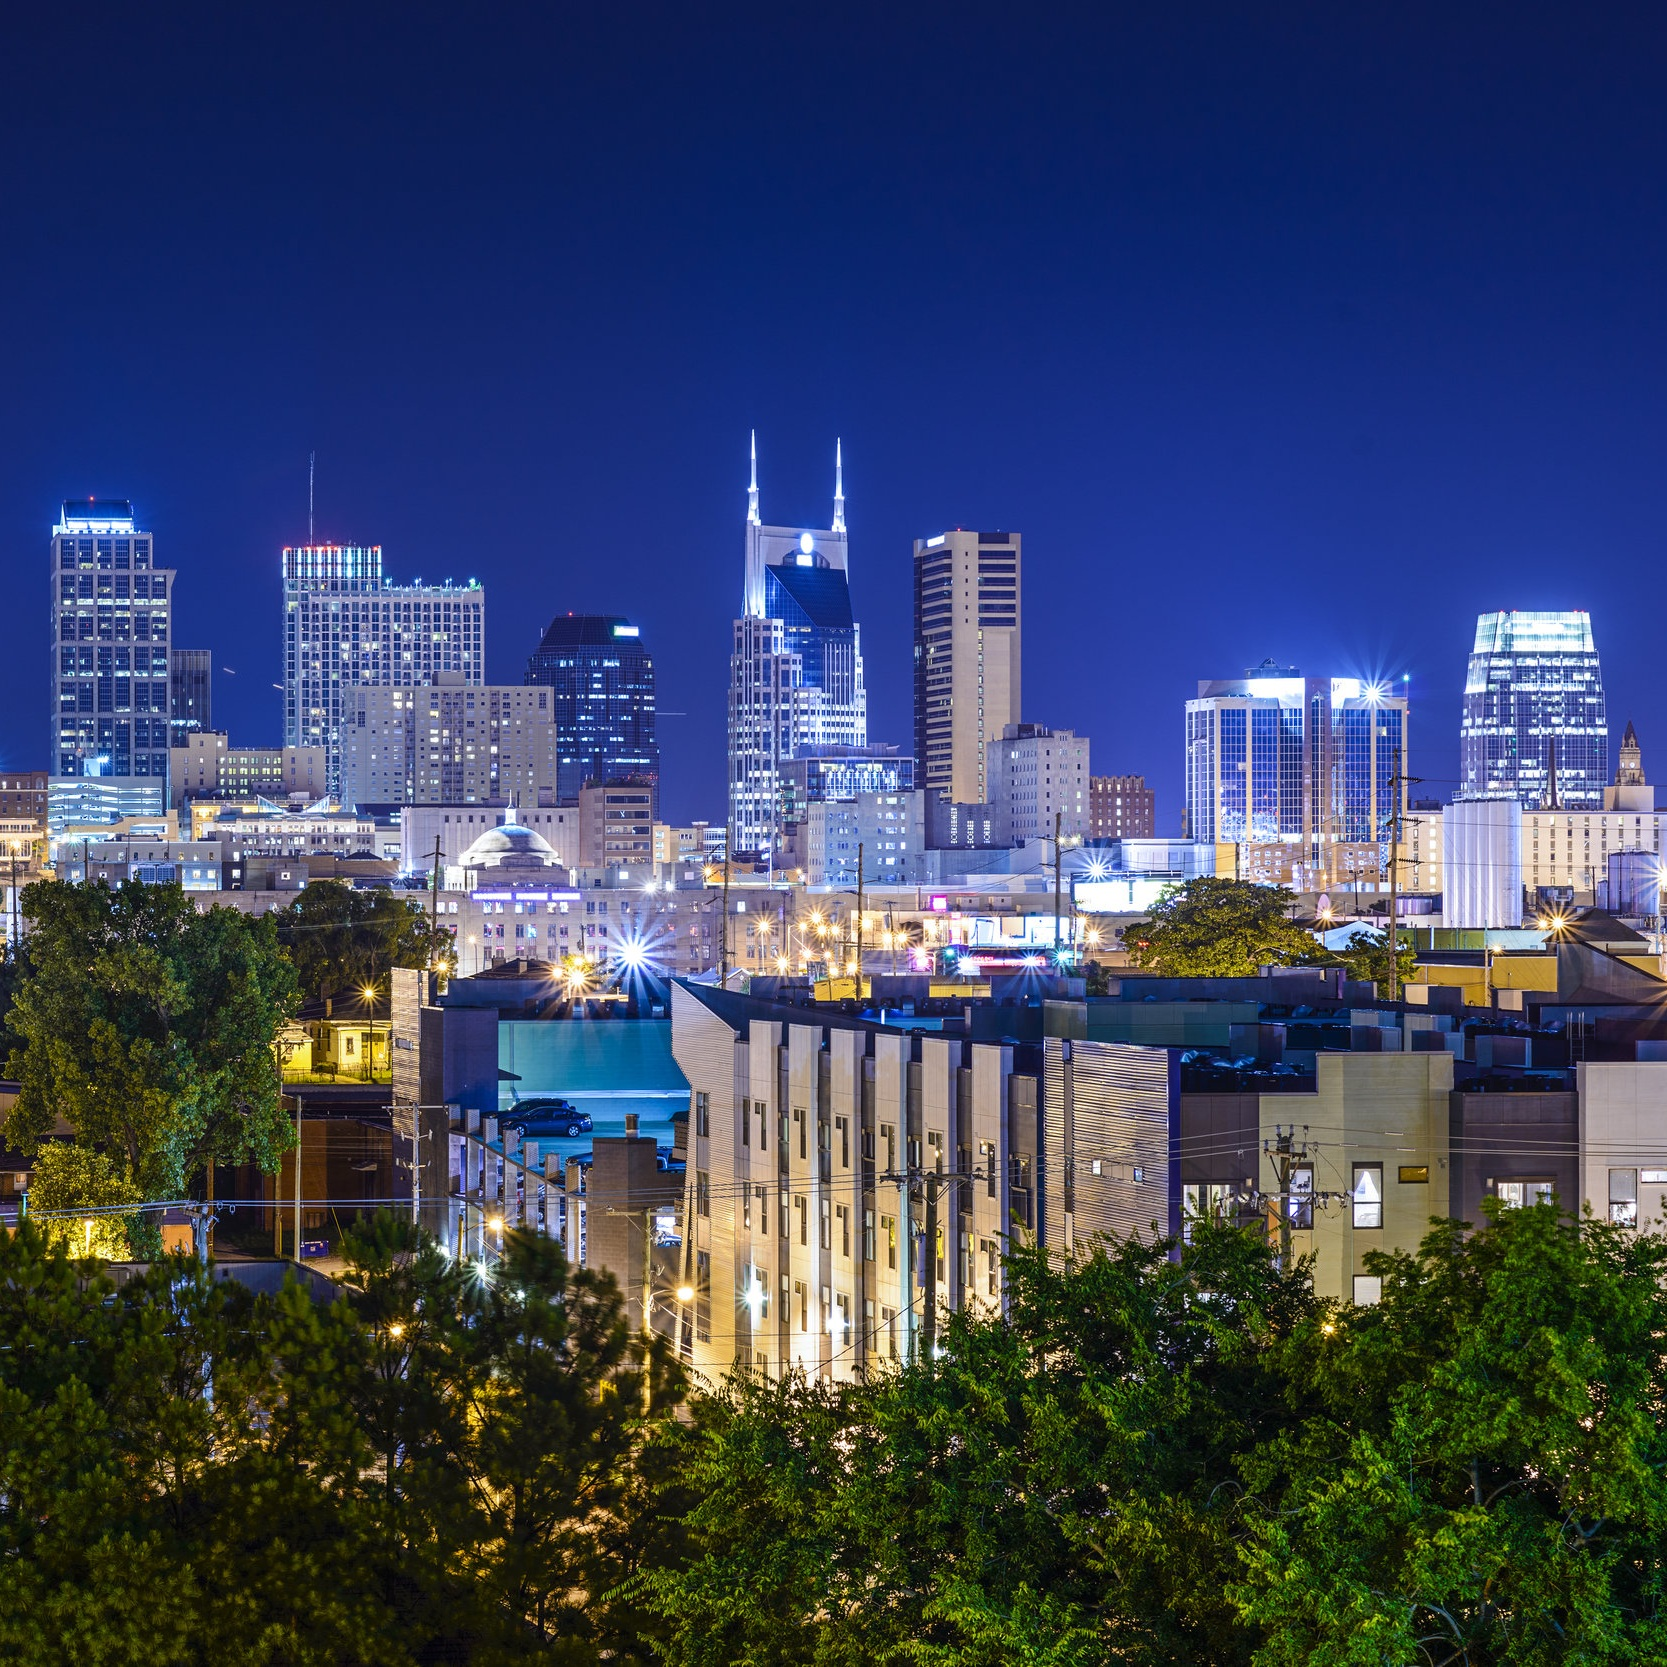 Nashville - Wang Vision Institute